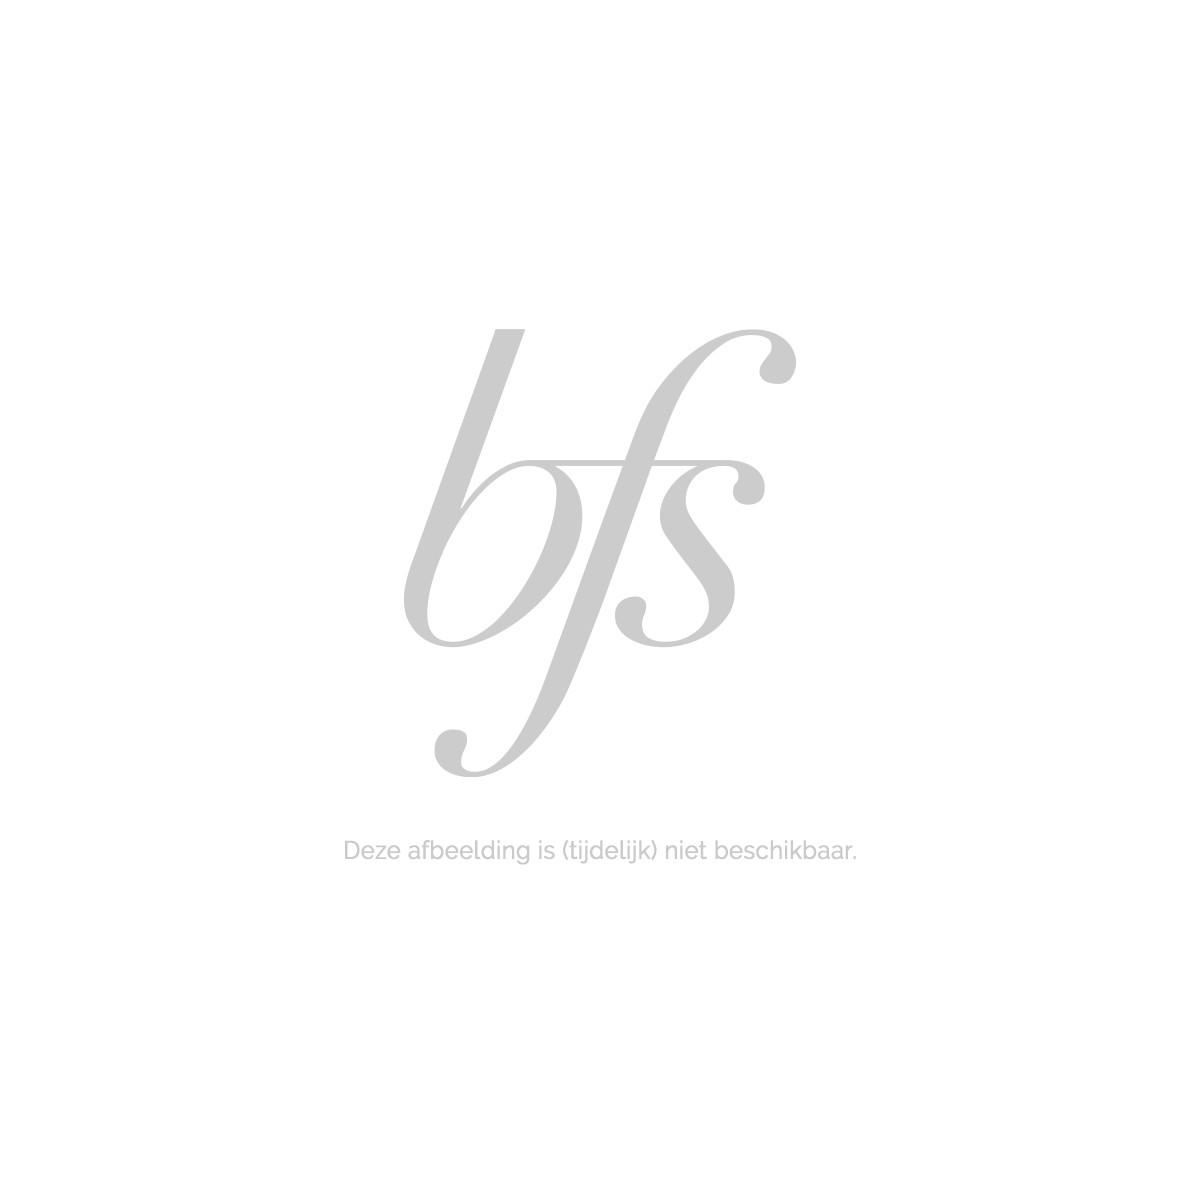 Afbeelding van Beautyblender Pure Kit Sponsjes Make up